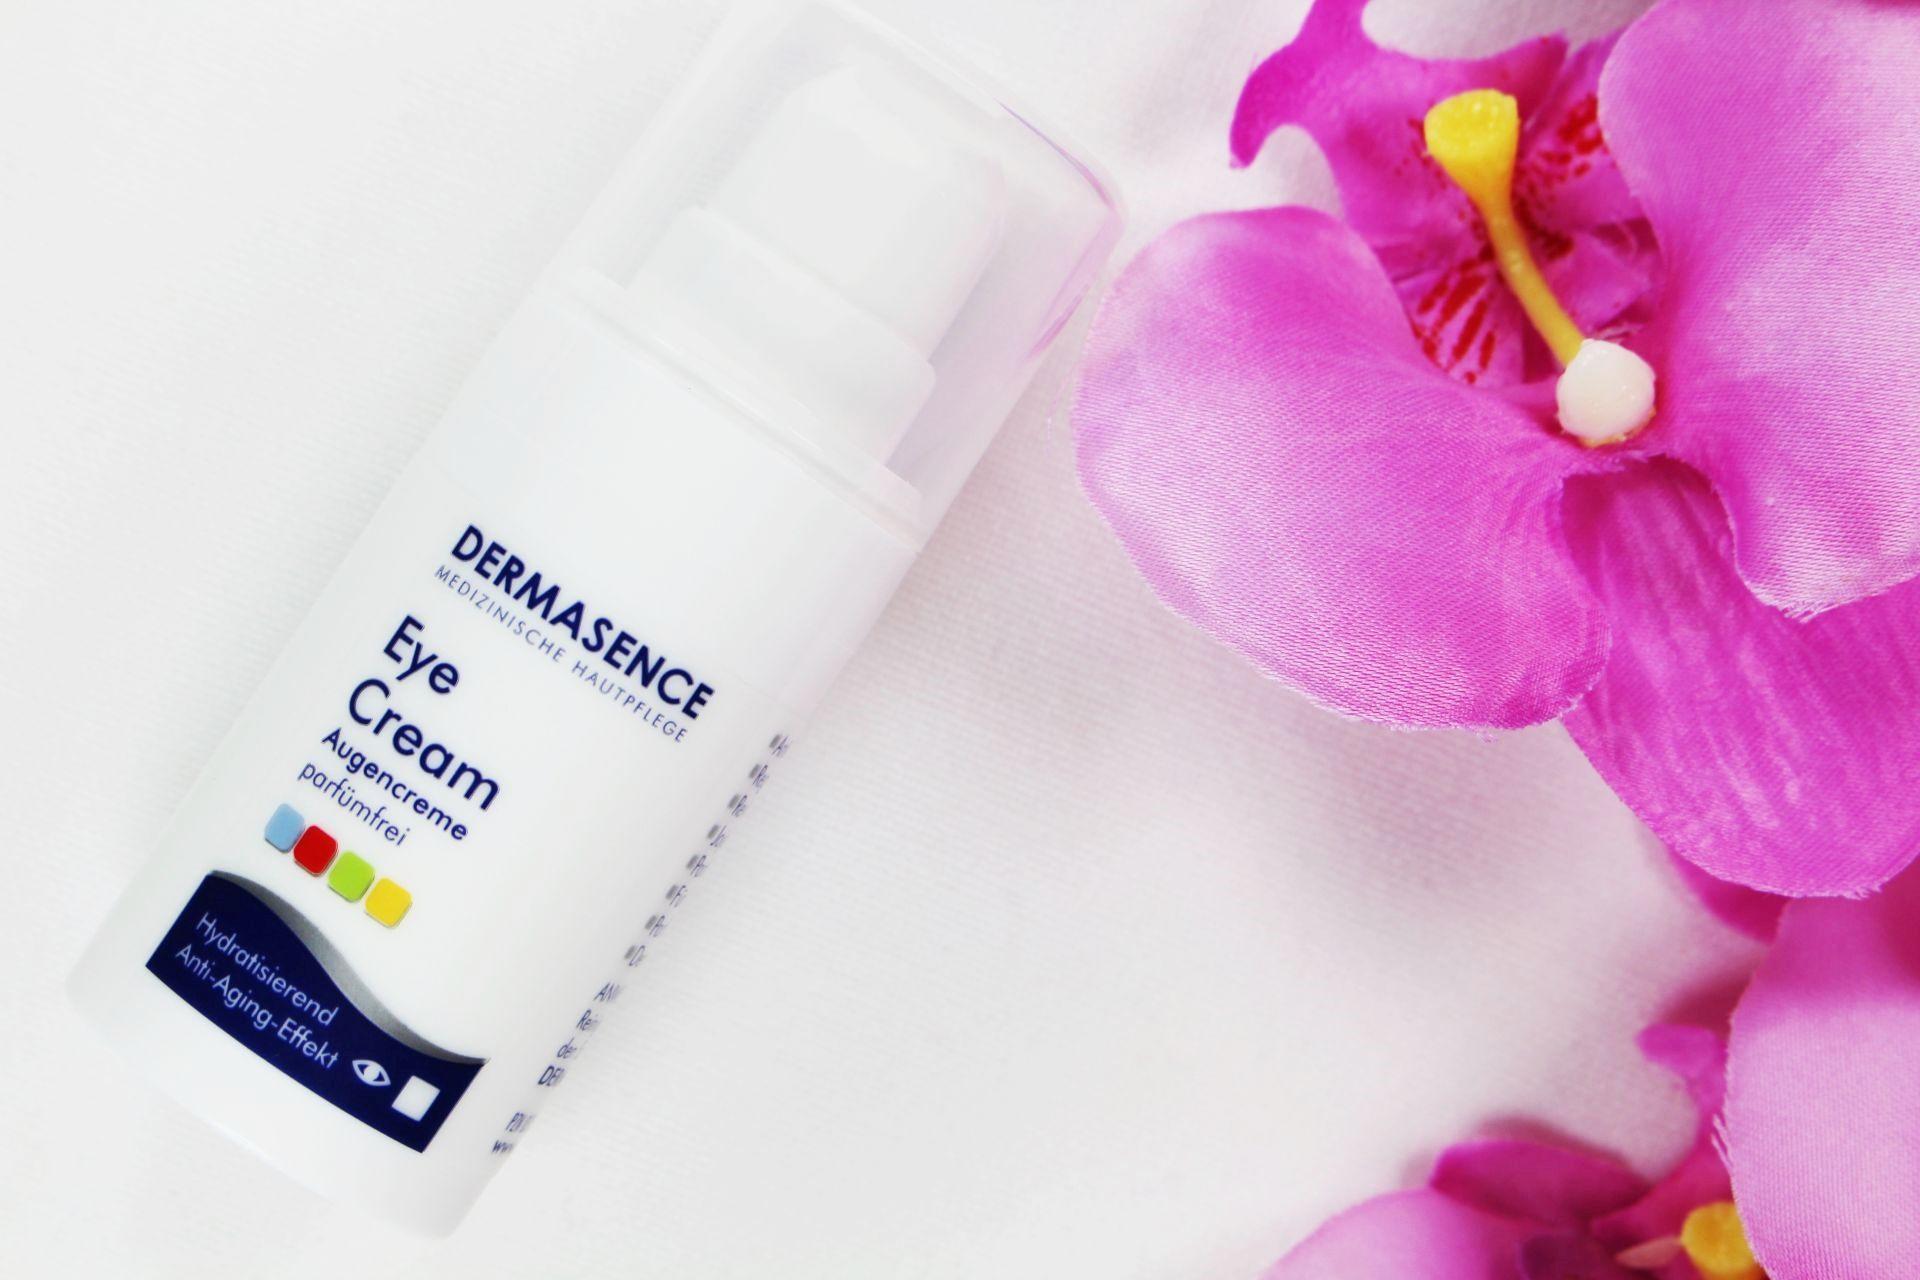 Dermasence Eye Cream, Anti-Aging Augencreme, Dermasence Augencreme, Dermasence Augencreme Inhaltsstoffe, Dermasence Review, Super Twins Annalena und Magdalena